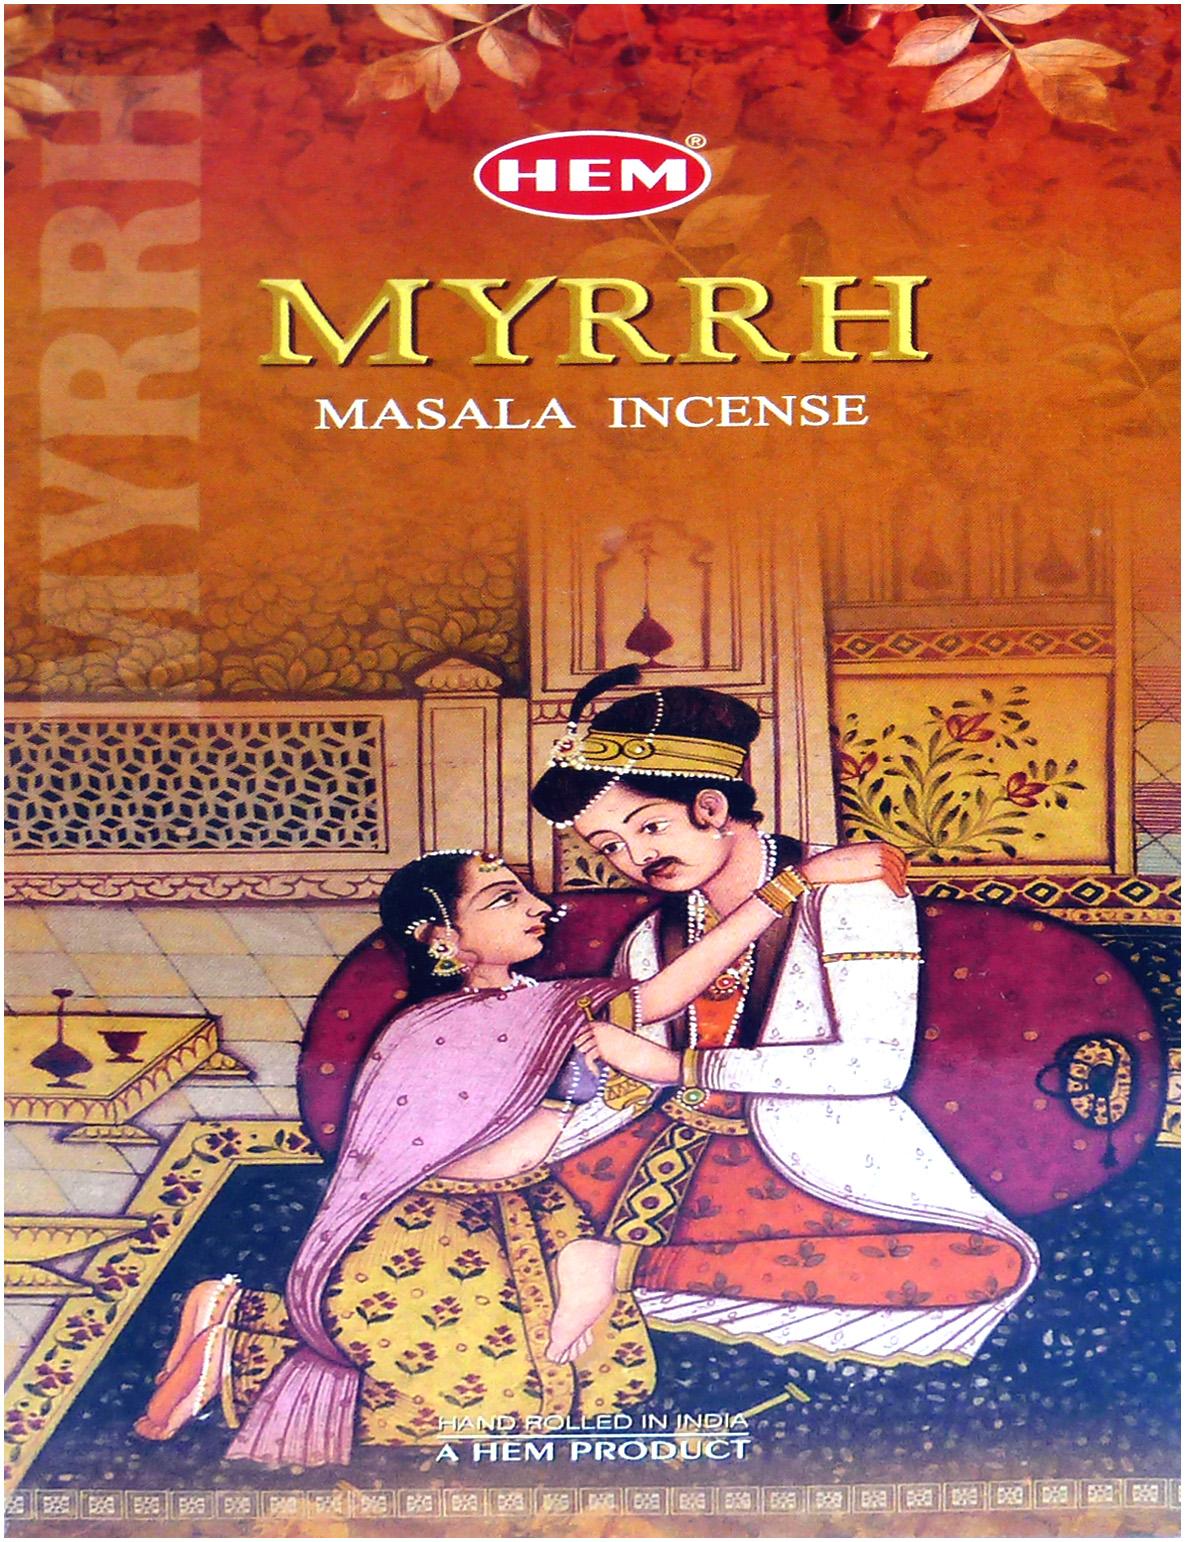 Encens hem flora masala myrrhe 15g